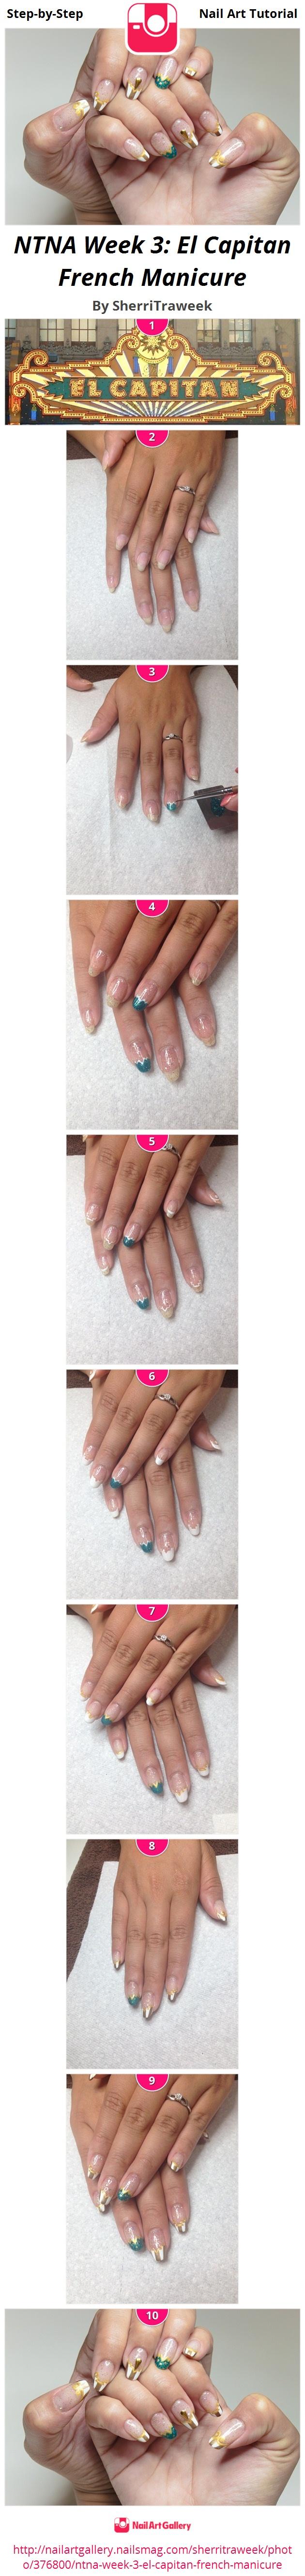 NTNA Week 3: El Capitan French Manicure - Nail Art Gallery